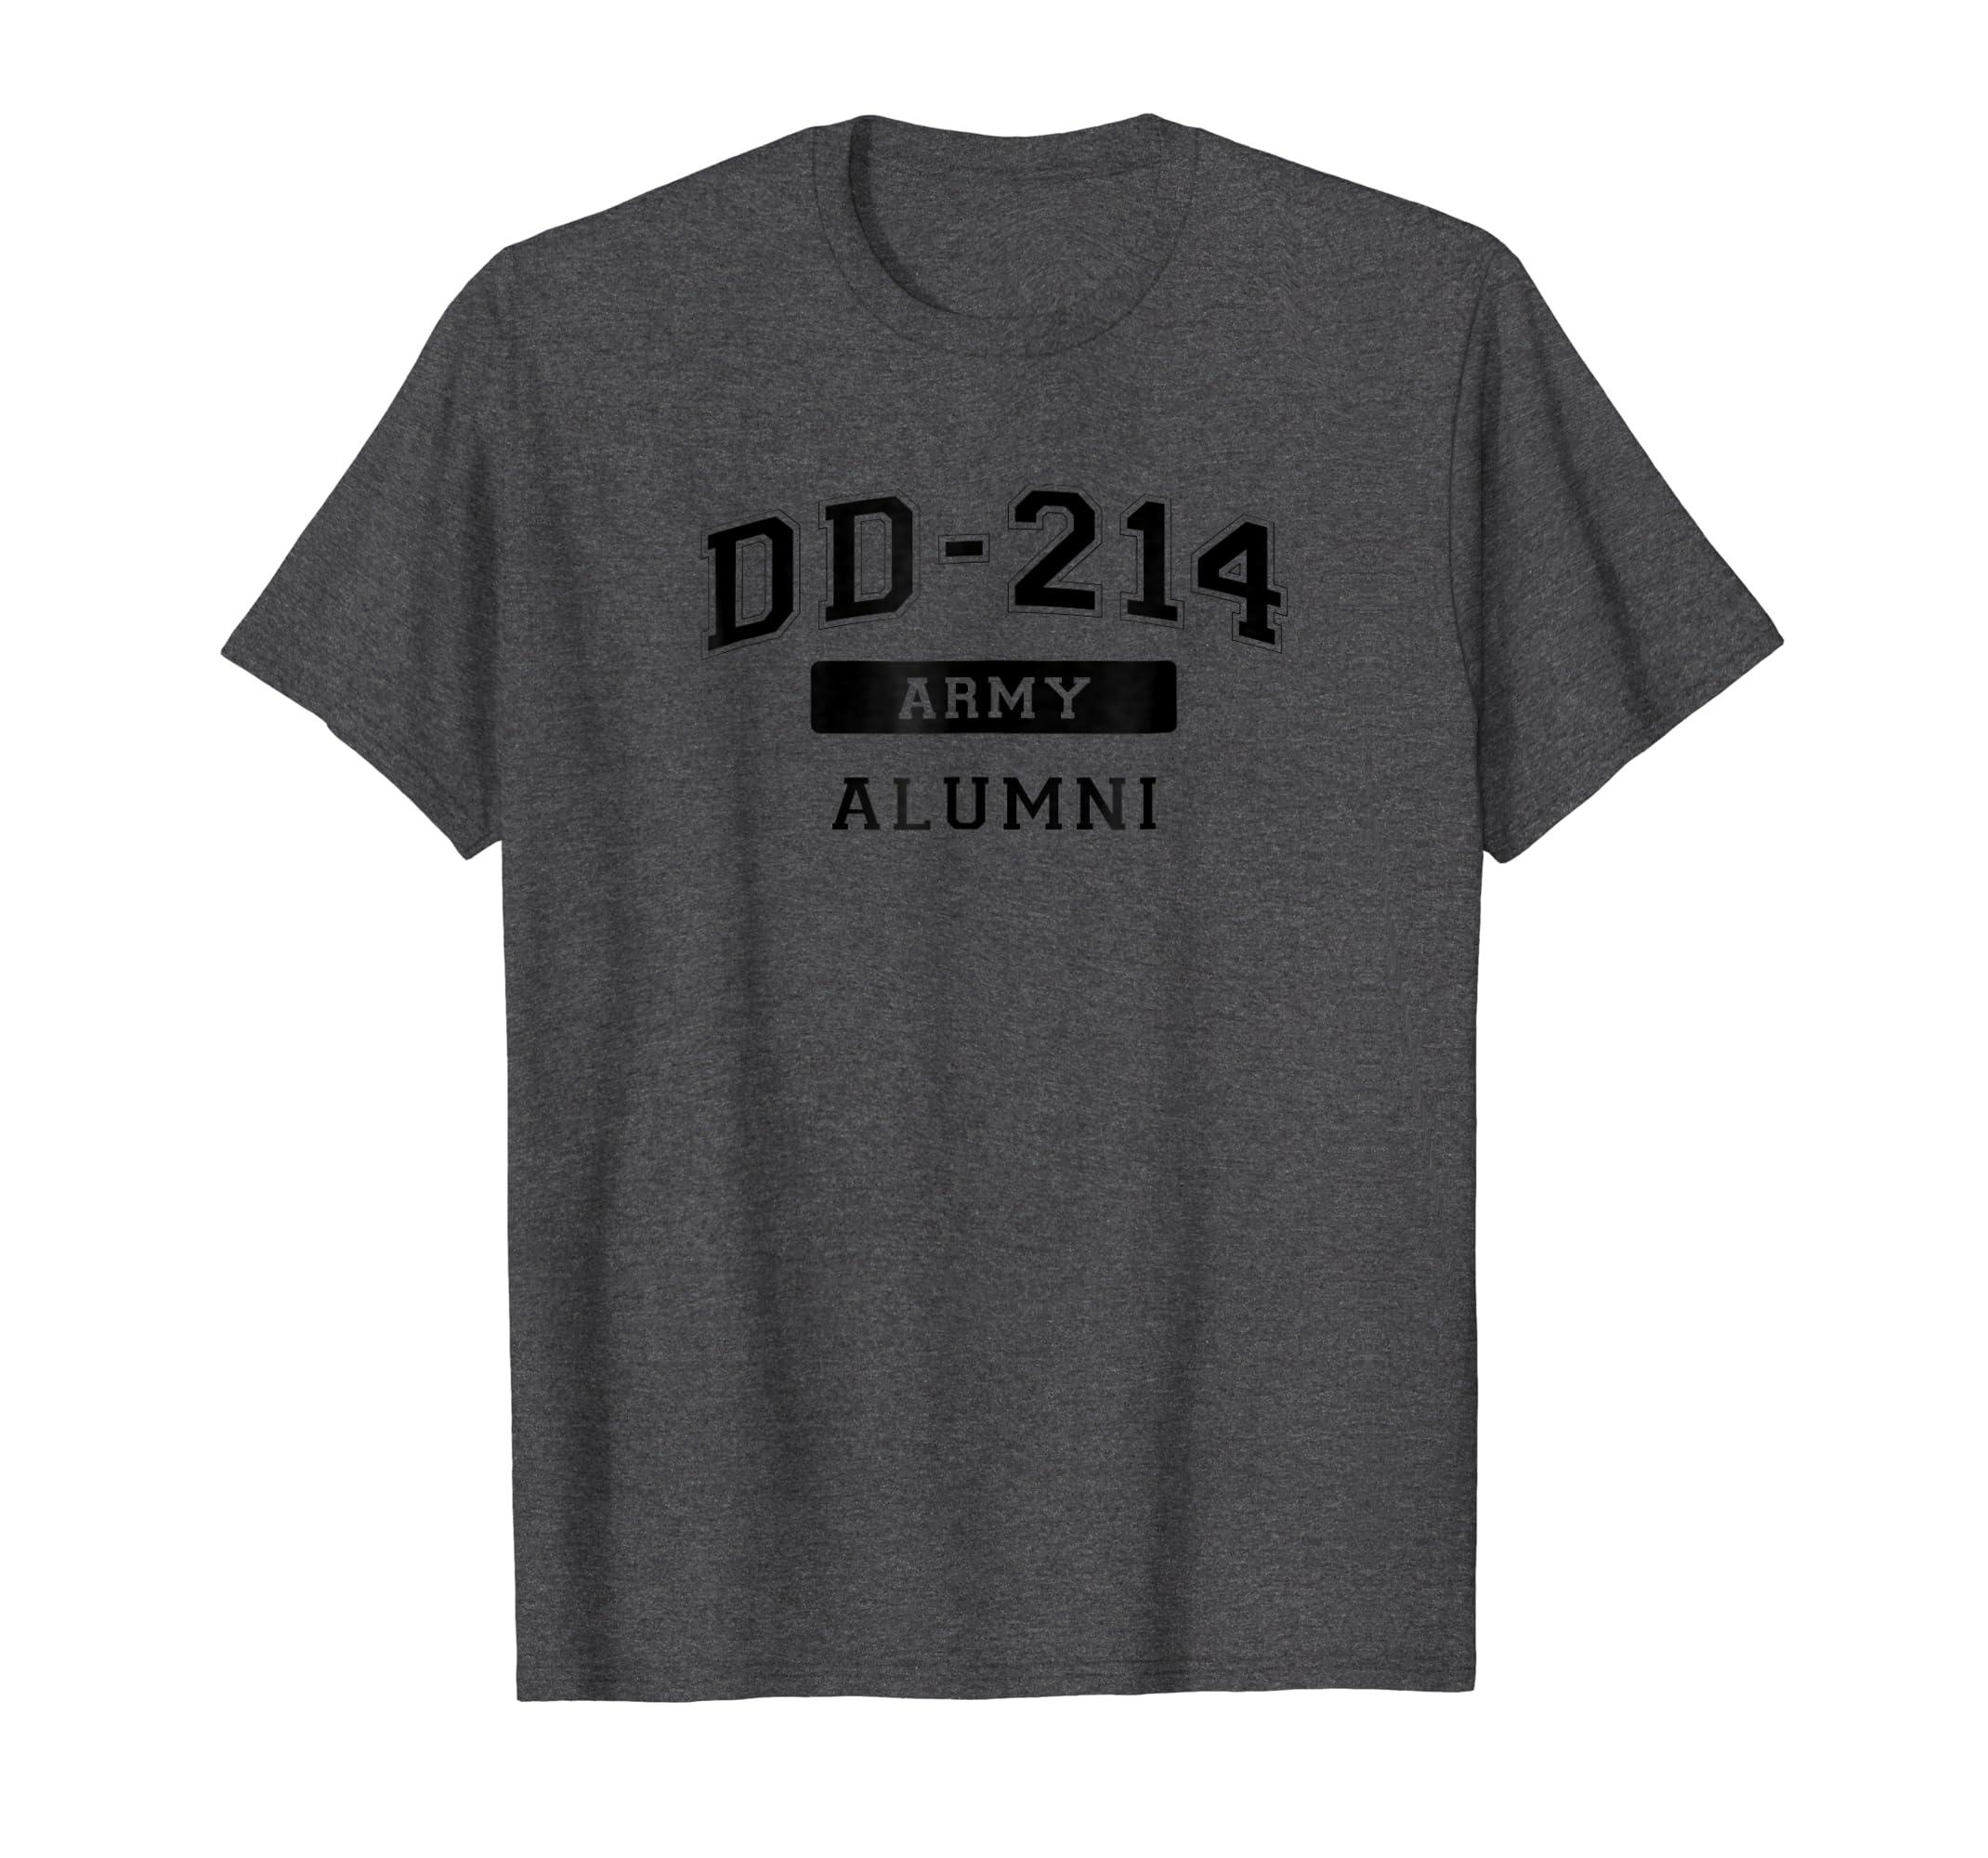 d280d484f Amazon.com: DD-214 US Army Alumni T-Shirt: Clothing